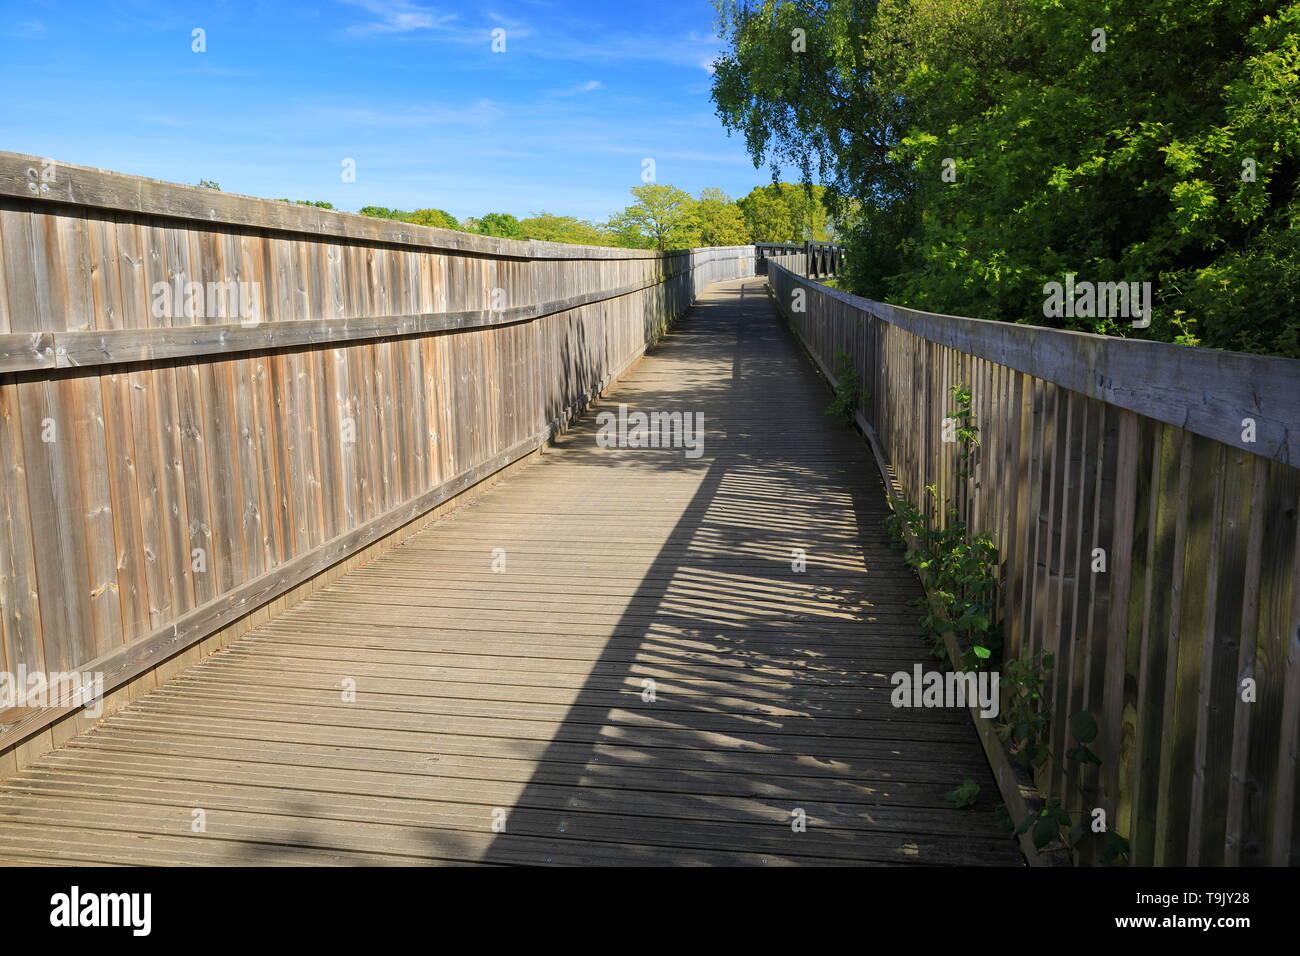 Exe estuary trail, Topsham, Devon, England, UK - Stock Image